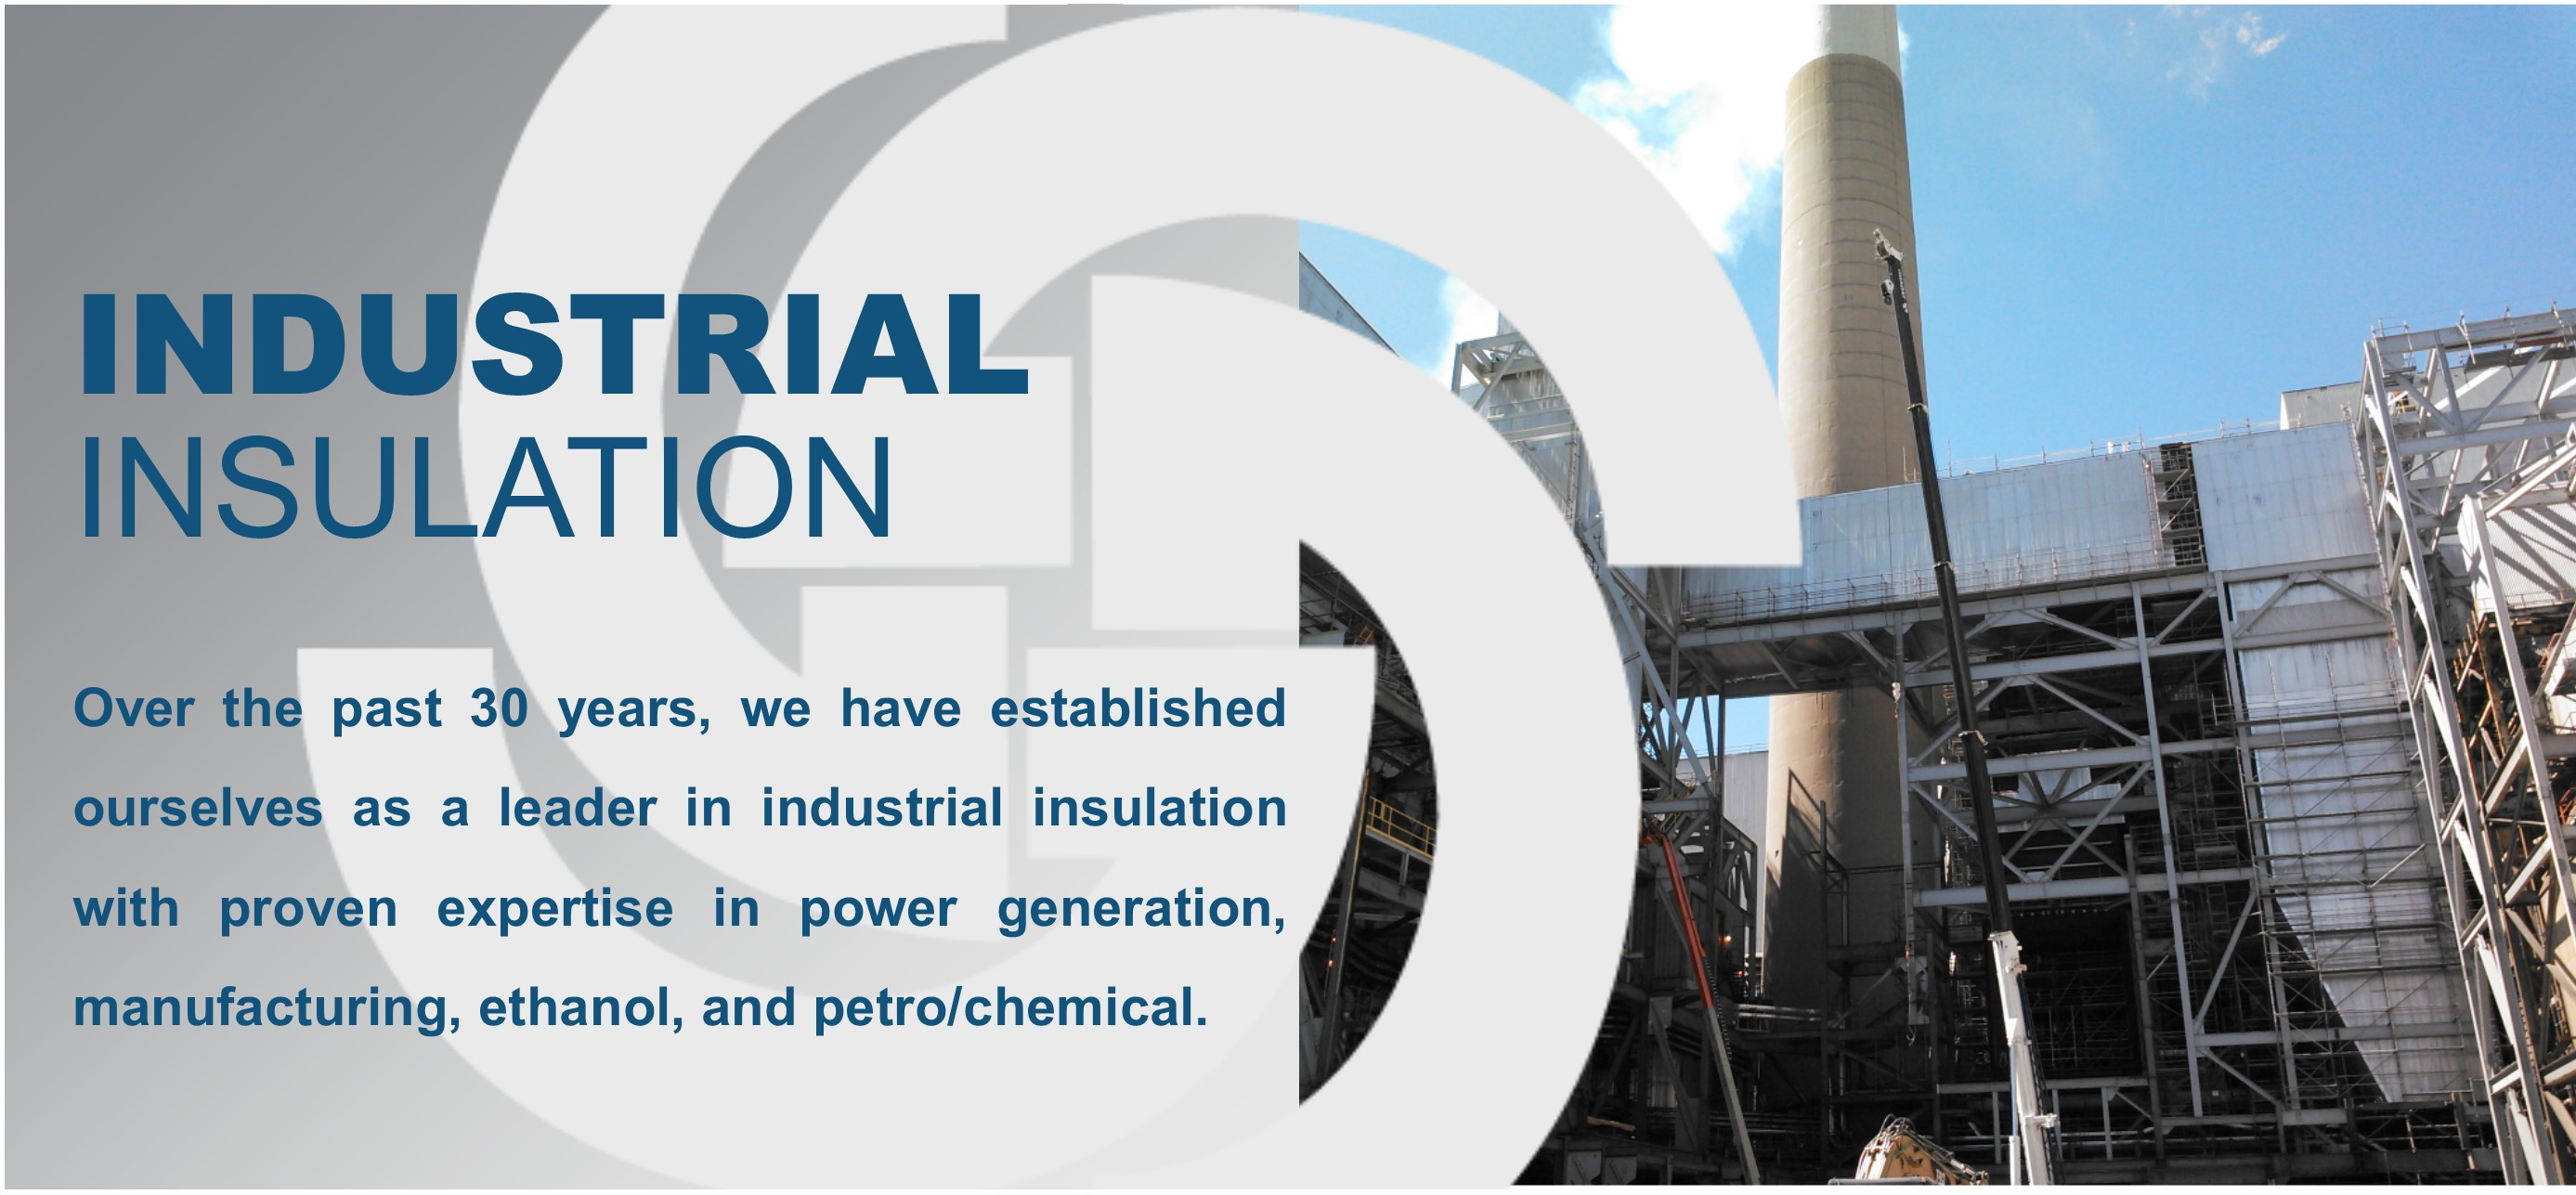 industrial-scrolling-2016